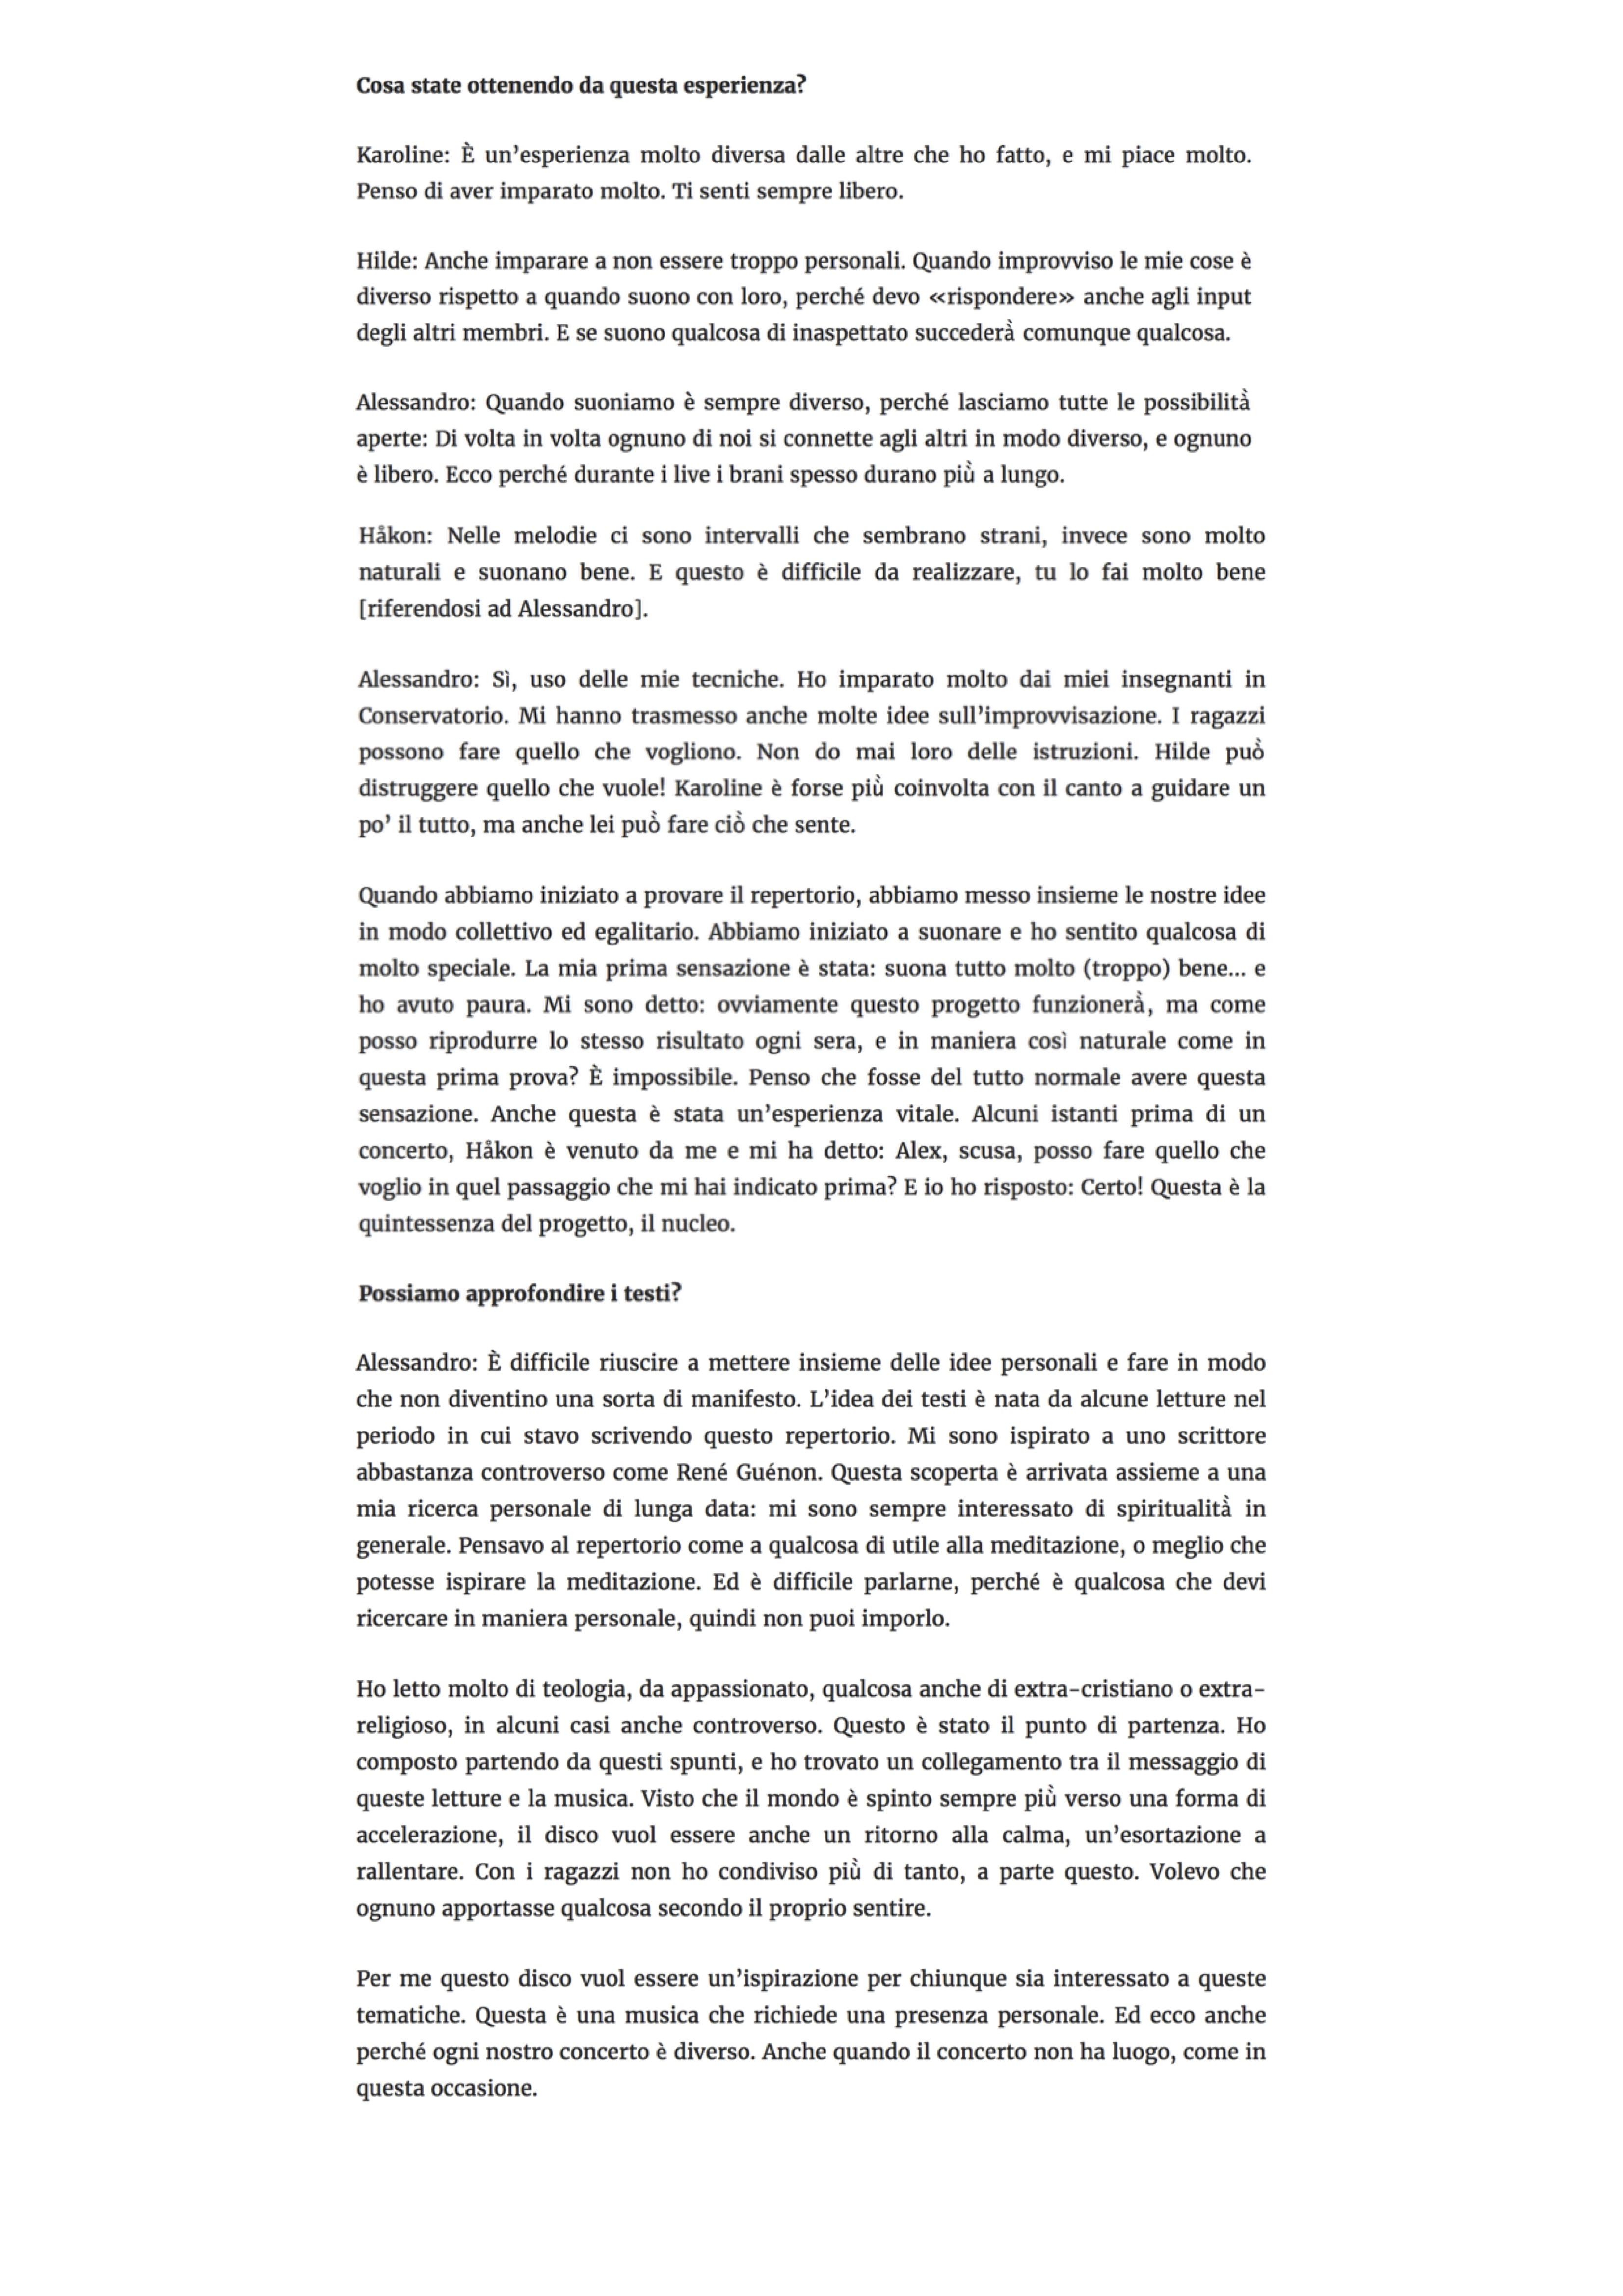 Forests - Interview Musica Jazz (11.05.20) 5